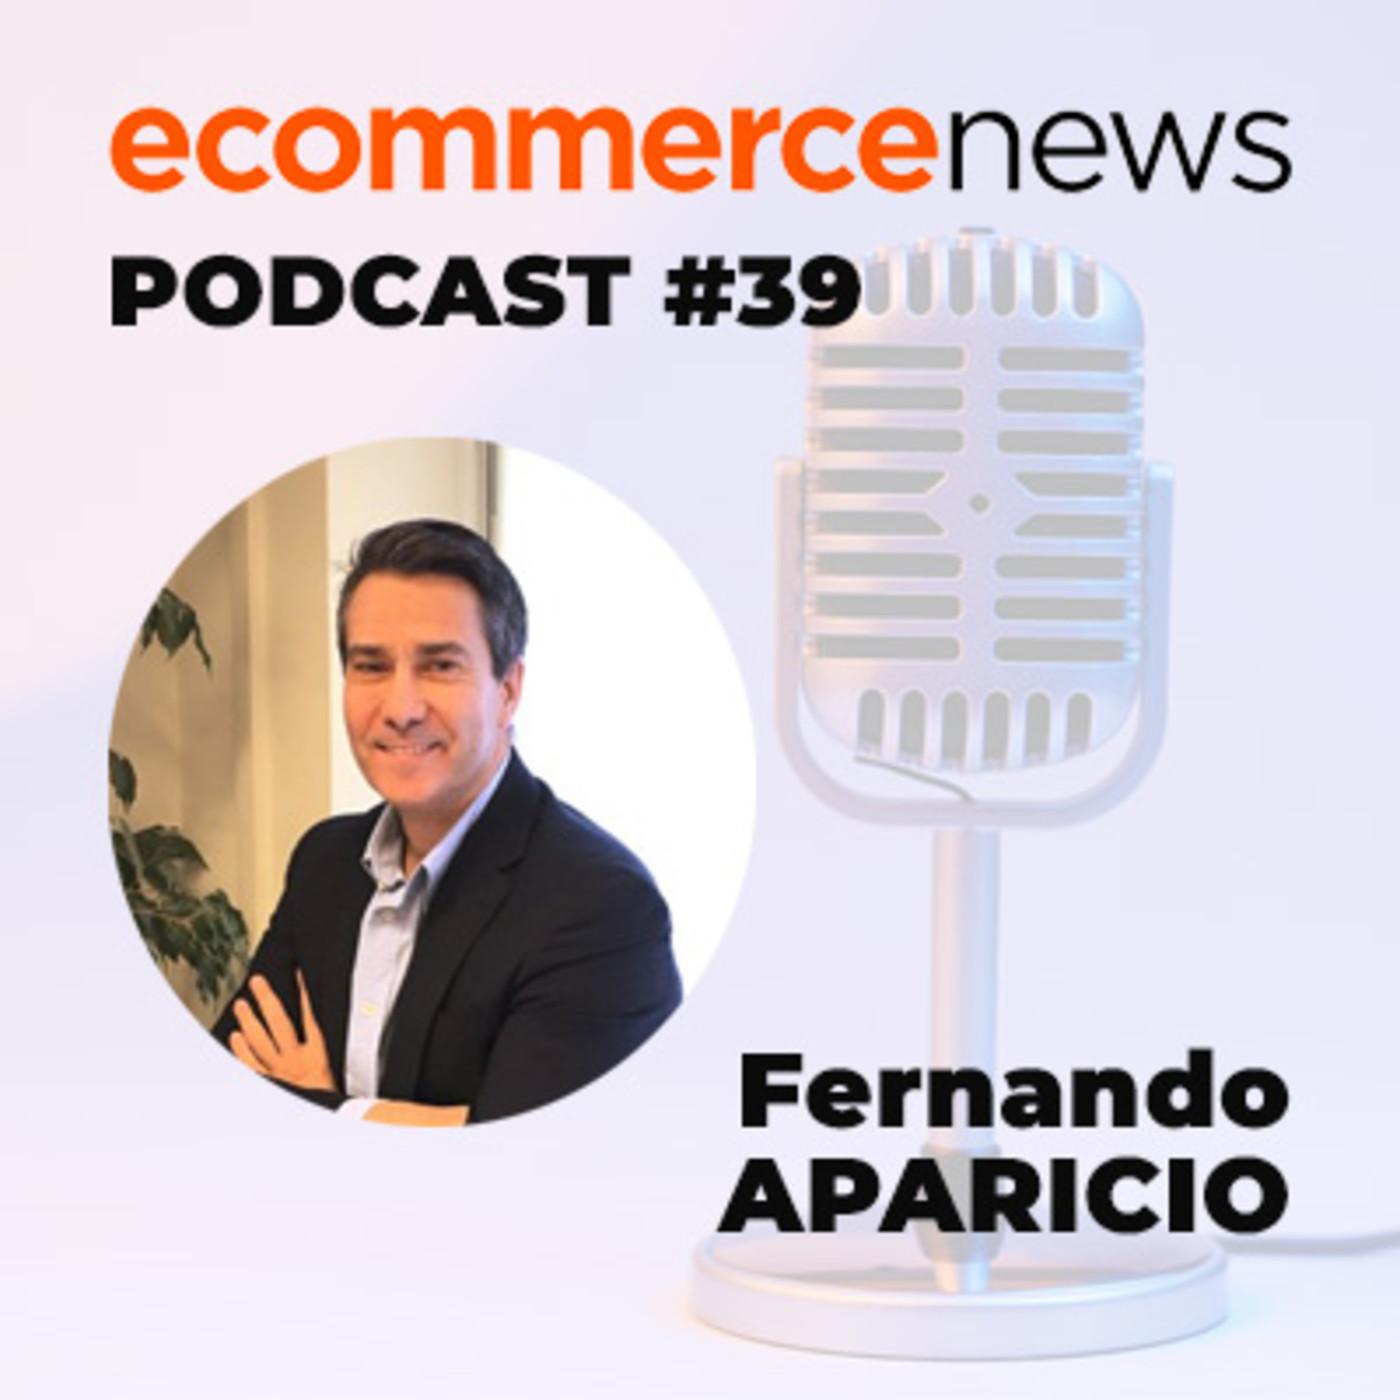 Ecommerce News Radio #39. Marketplaces B2B: Abordando un maravilloso mundo nuevo